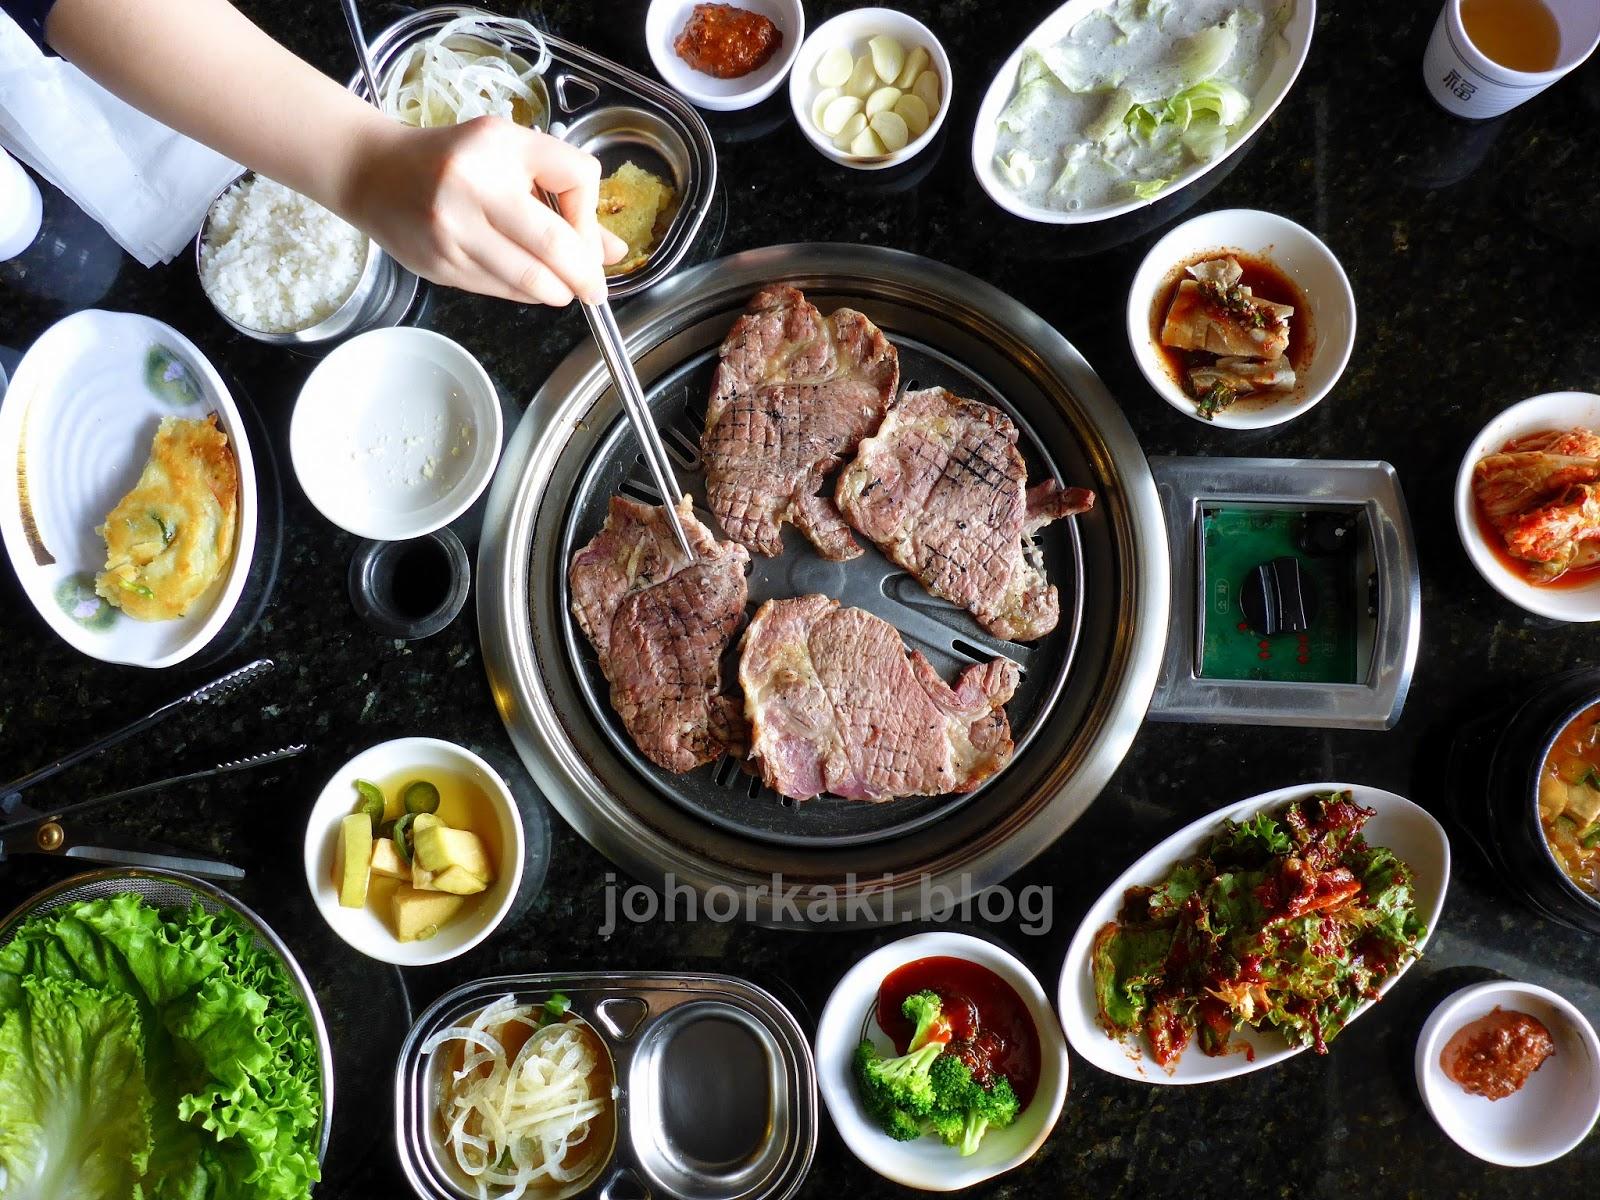 piggy 39 s korean bbq restaurant in thornhill toronto johor. Black Bedroom Furniture Sets. Home Design Ideas